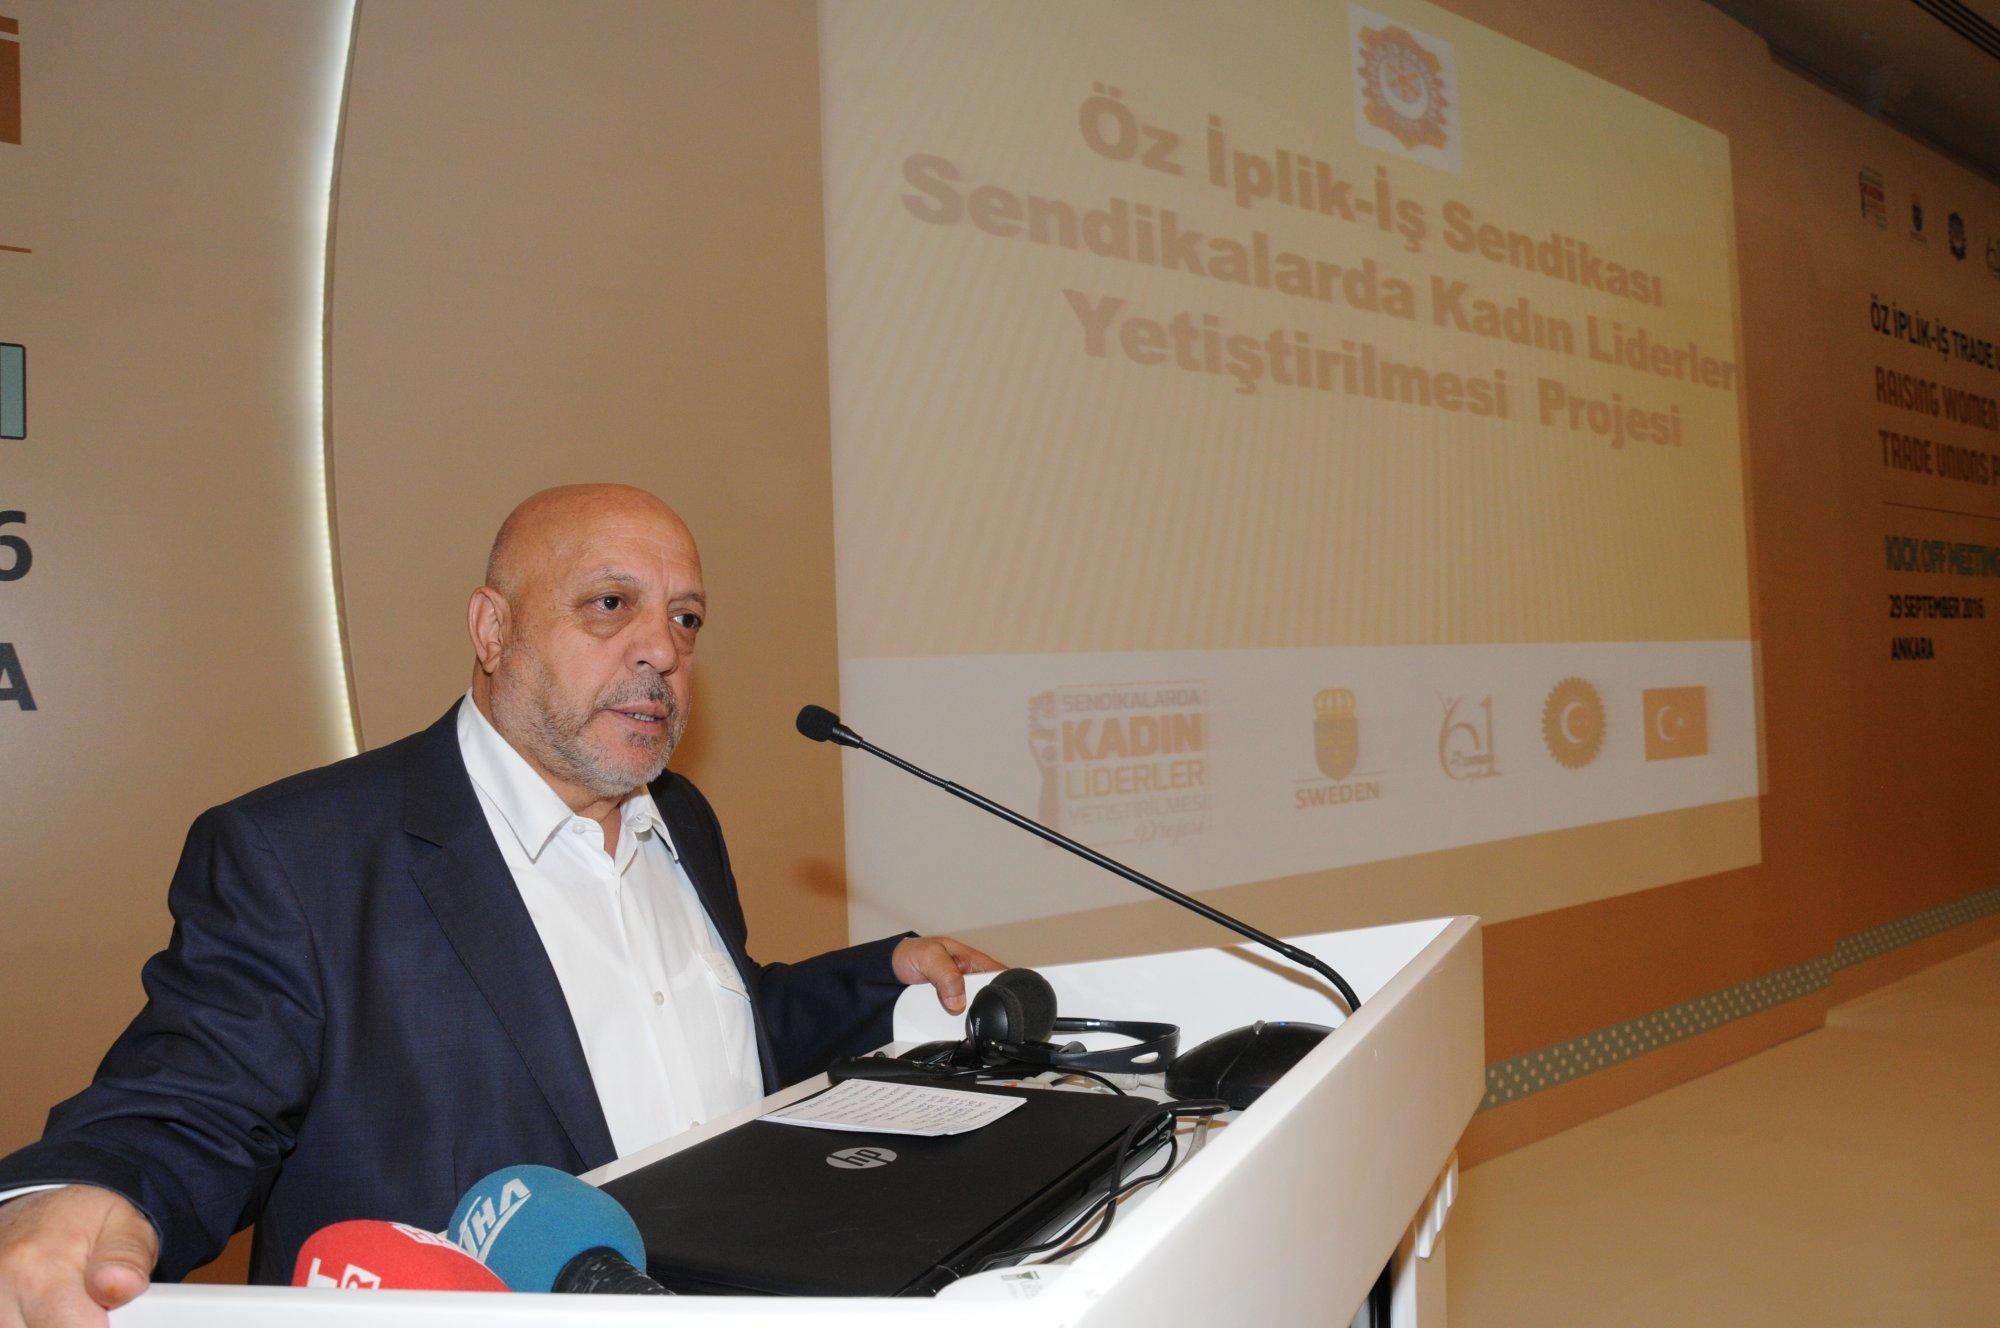 ARSLAN, ÖZ İPLİK İŞ SENDİKASININ PROJE TOPLANTISINA KATILDI